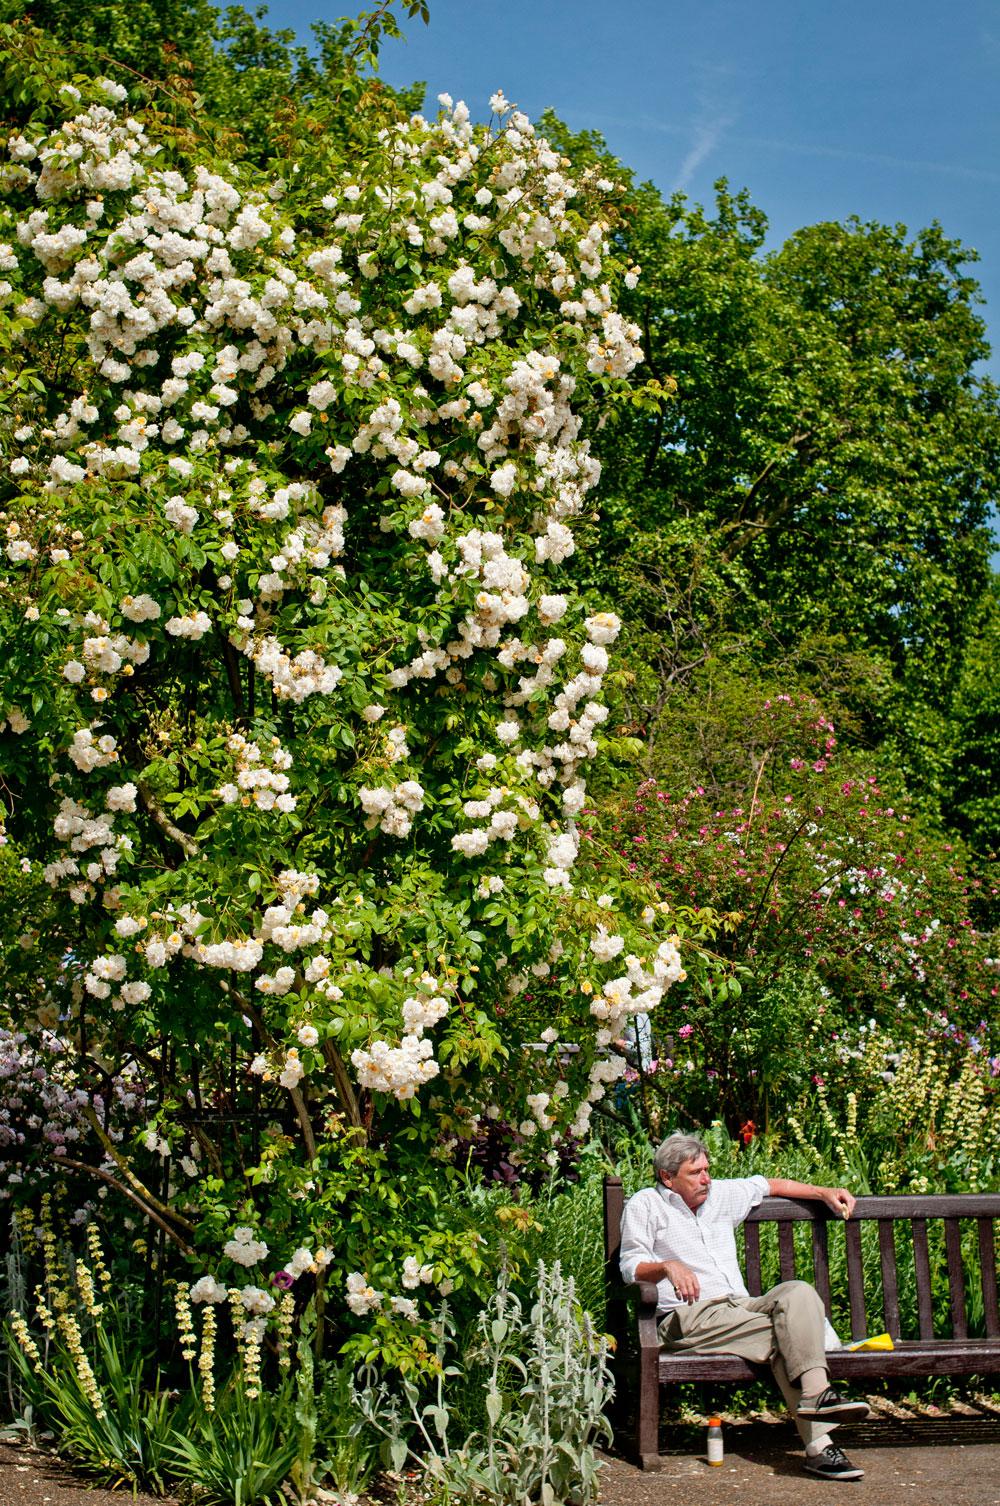 Rose garden at Diana, Princess of Wales Memorial Walk, Hyde Park. Photo © Zarina Holmes